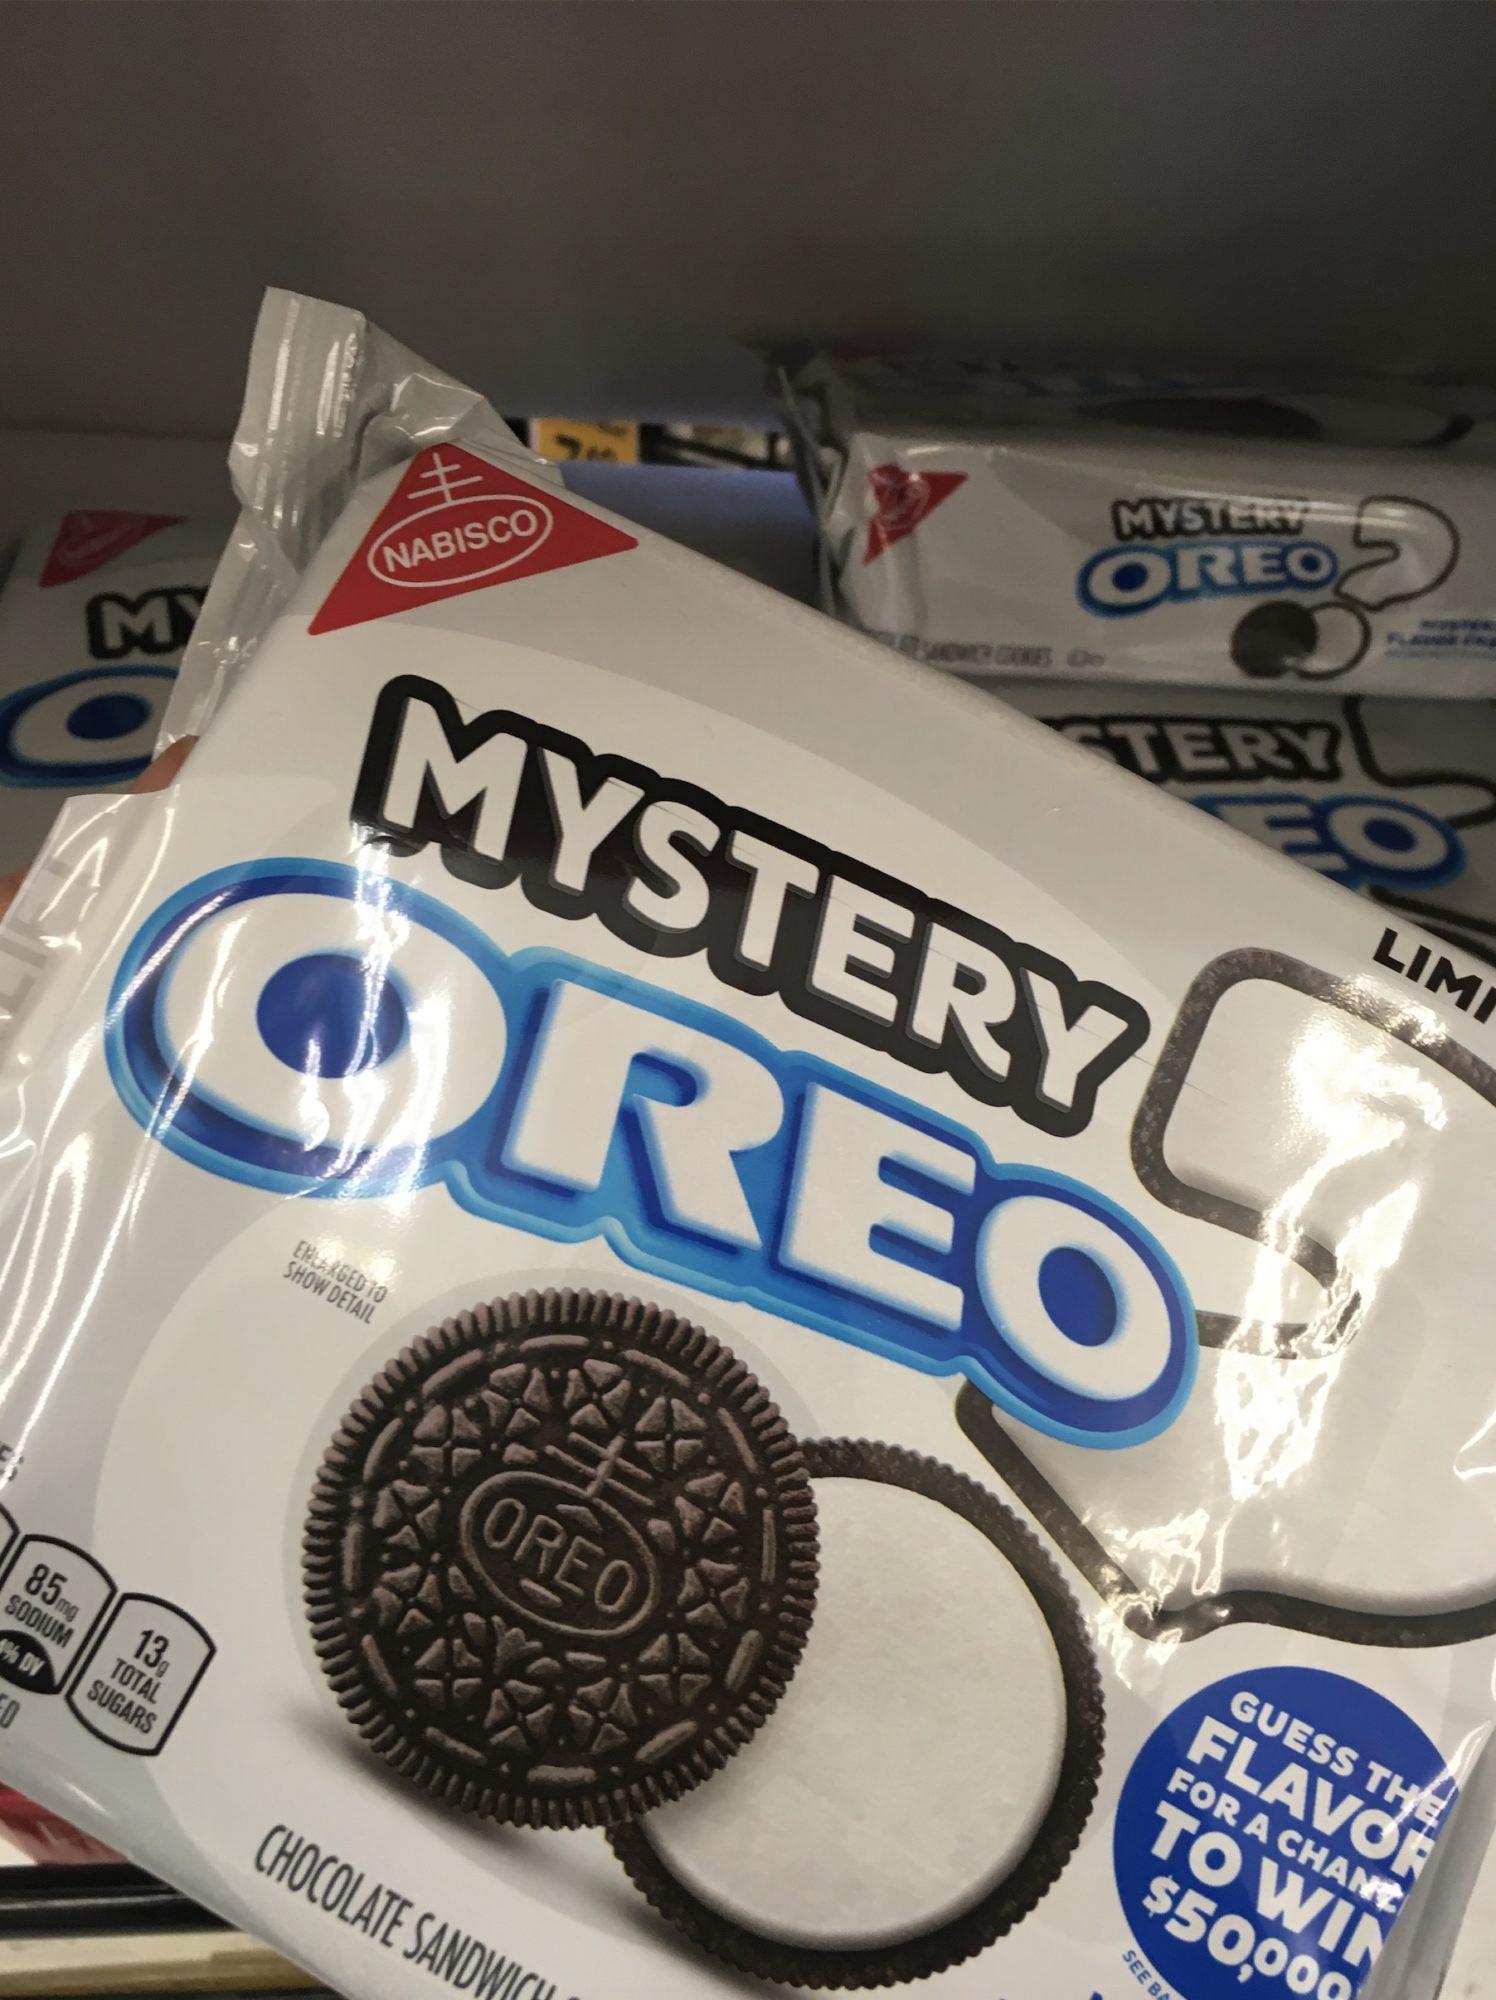 2019 Oreo Mystery Flavor Cookies